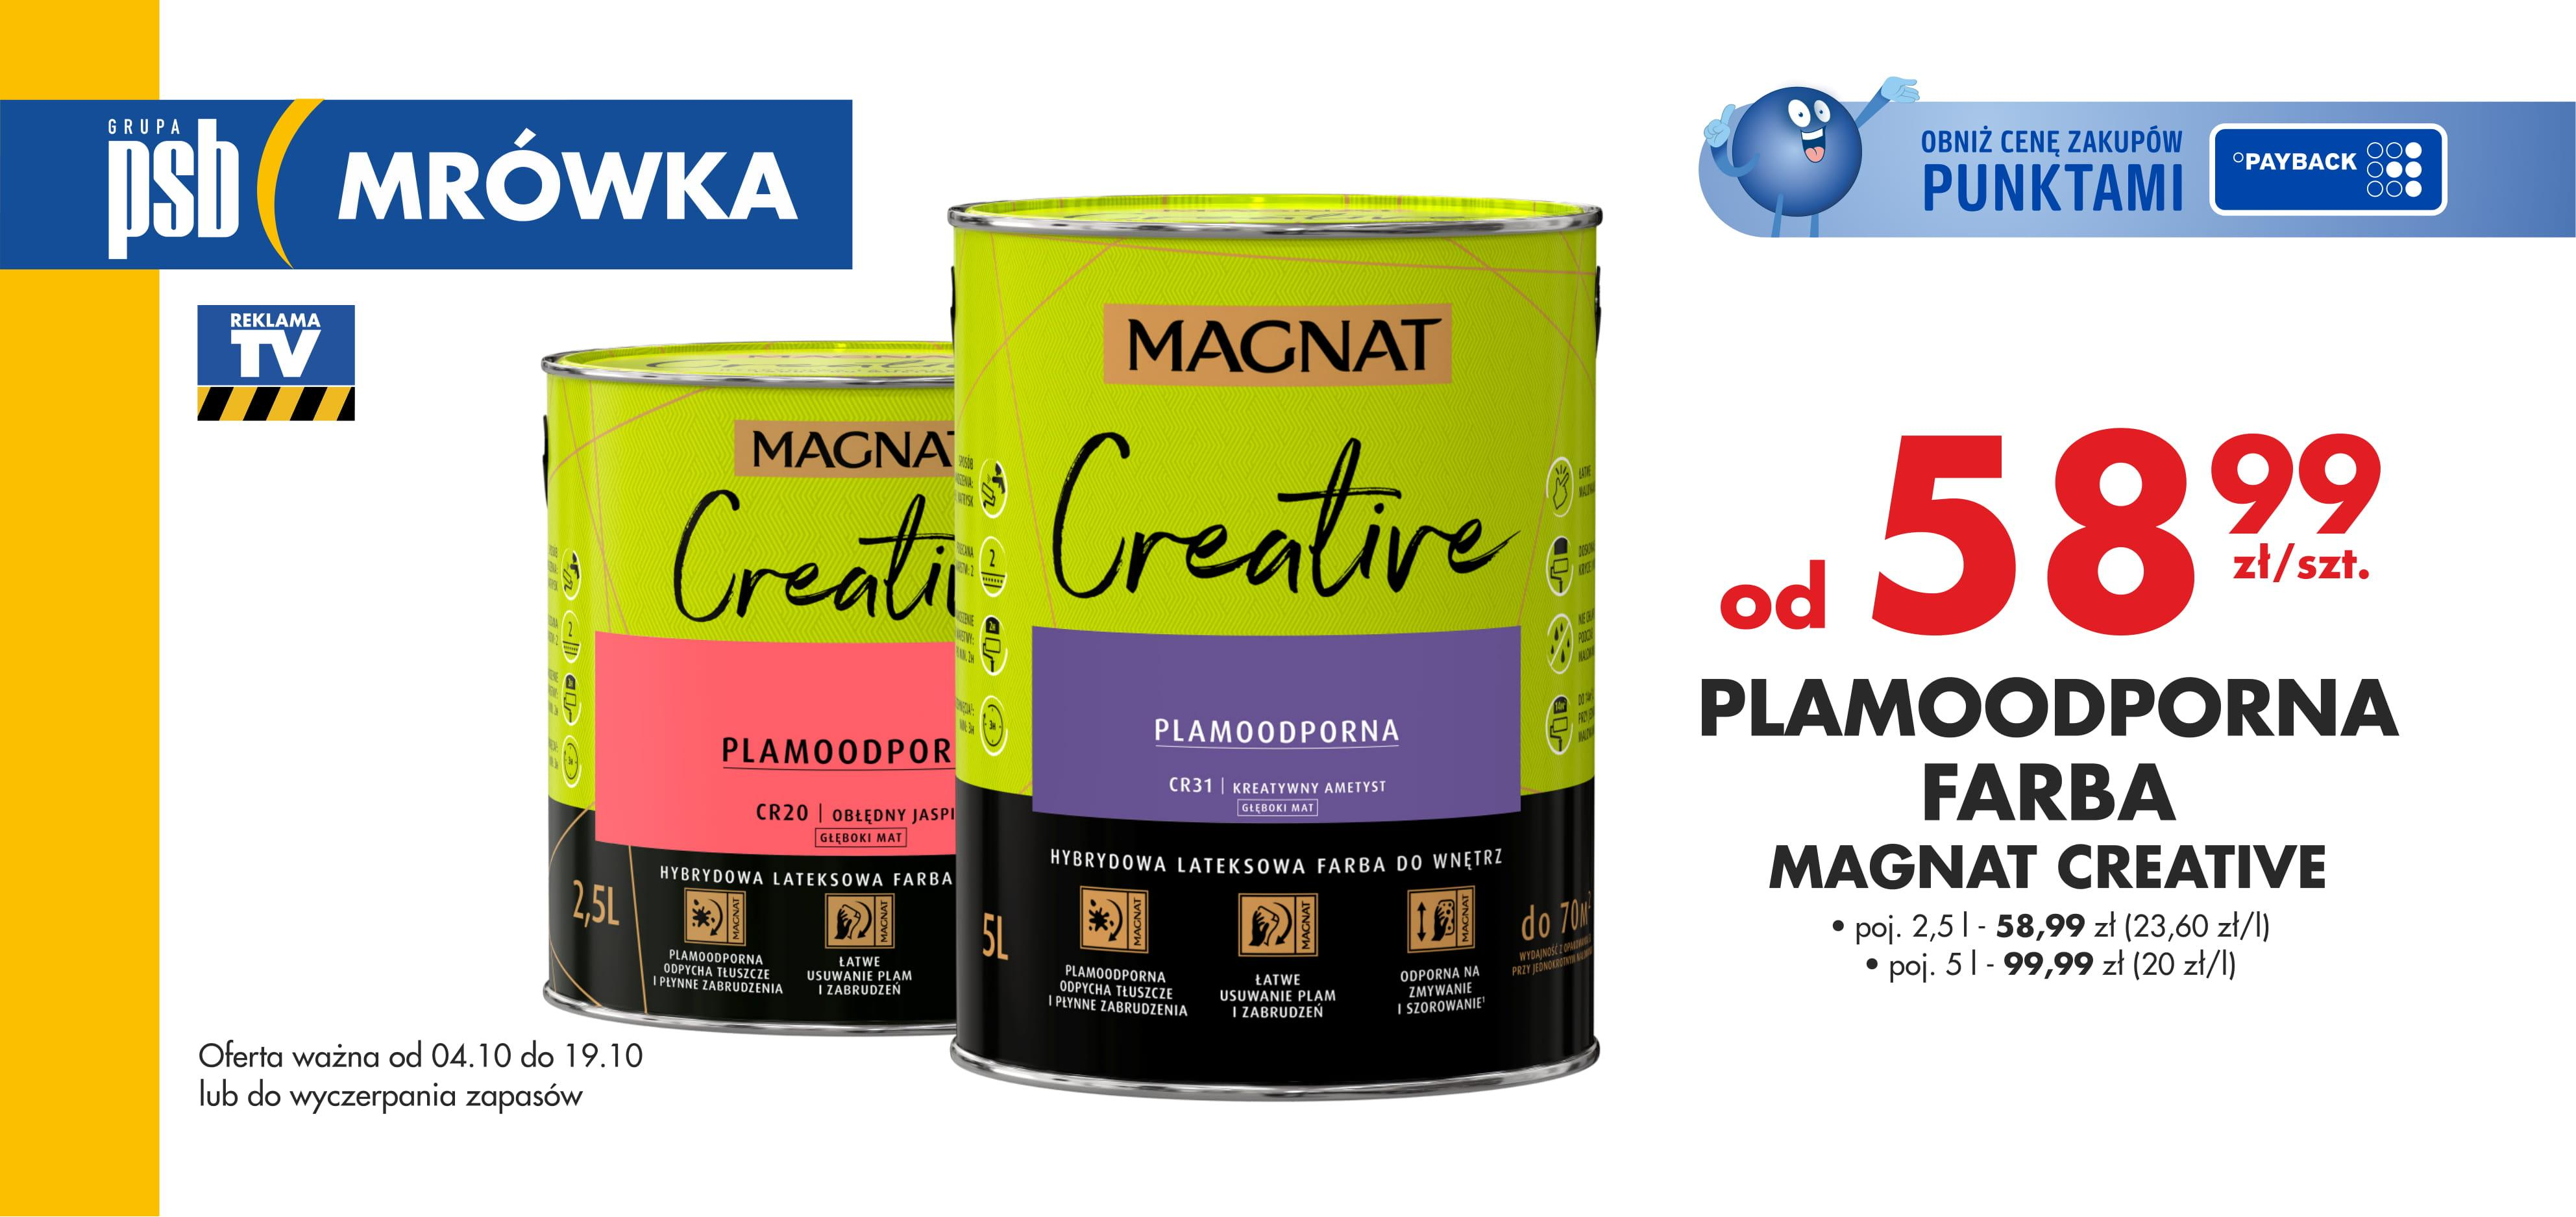 Magnat-creative-504x238-1